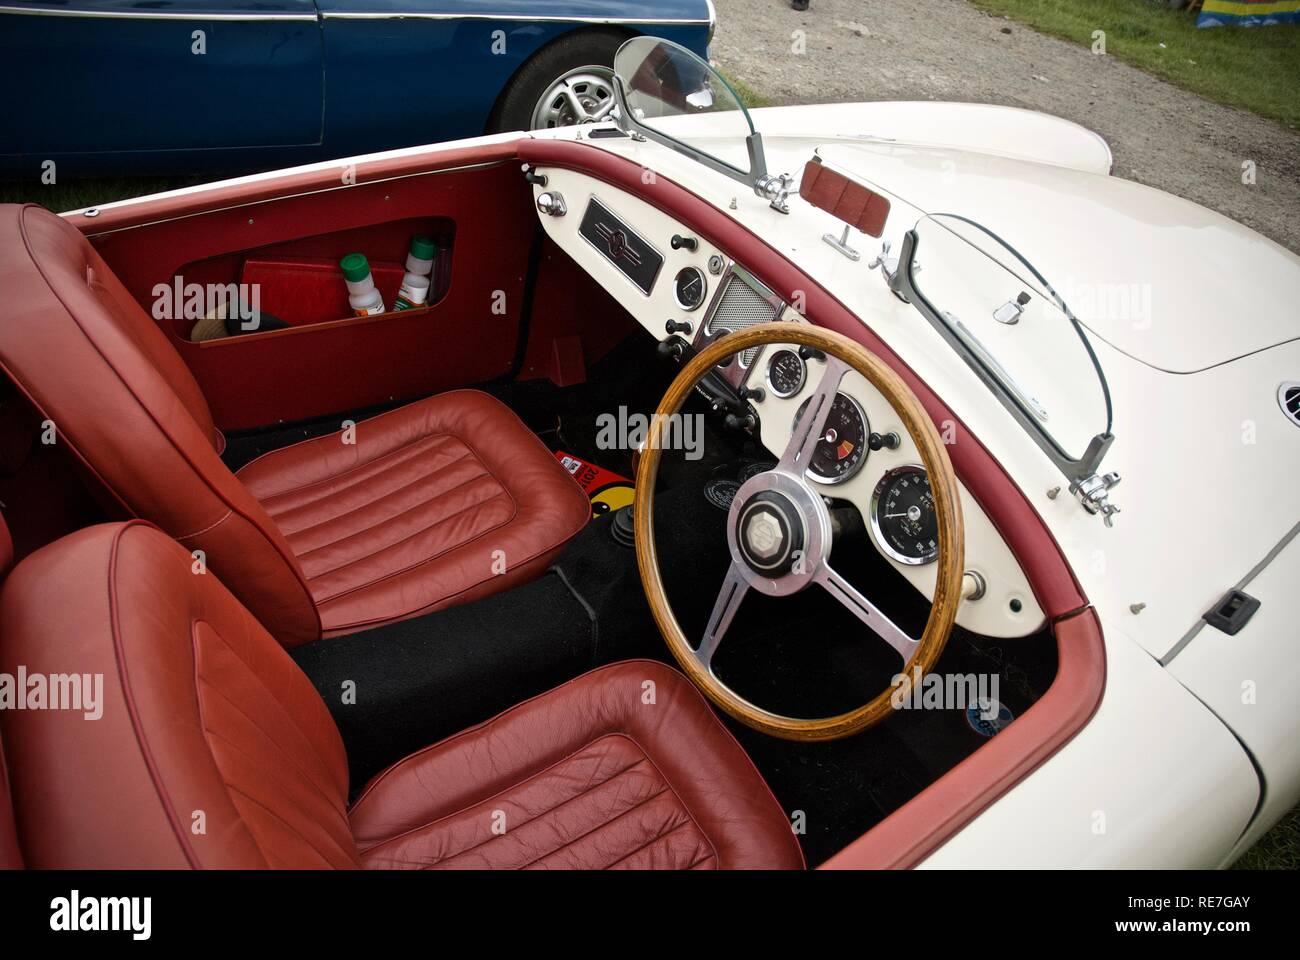 Interior of an MGA at the Anglesey Vintage Rally, Anglesey, North Wales, UK, May 2015 - Stock Image